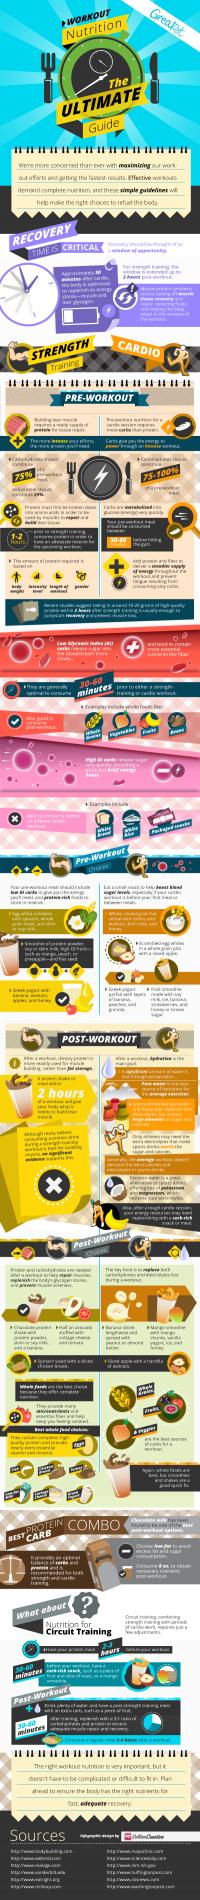 workout-nutrition.png (PNG Image, 600×5701 pixels)